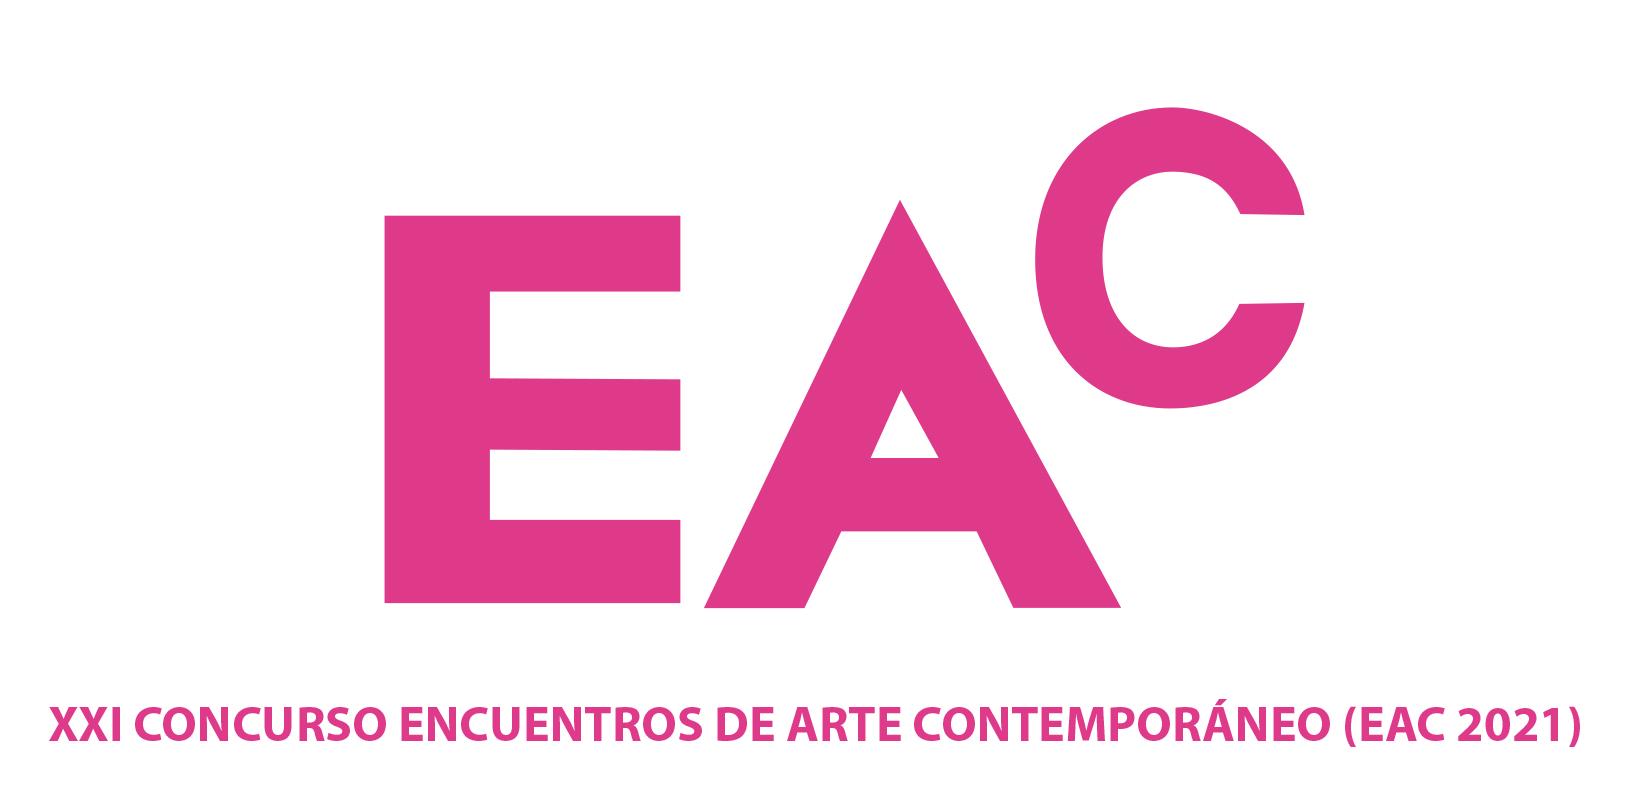 EAC 2021 - XXI Concurso de Encuentros de Arte Contemporáneo